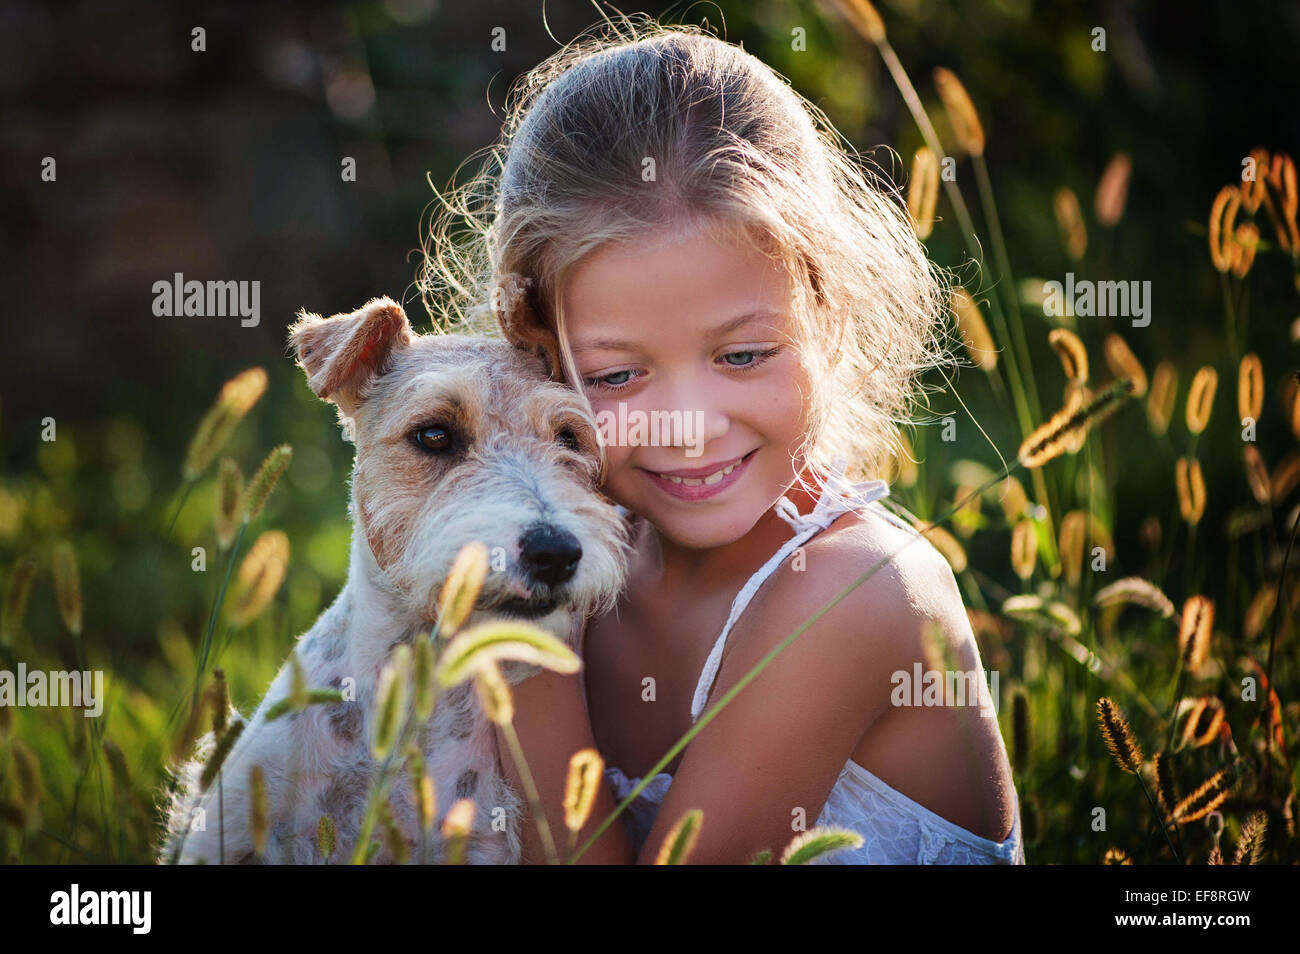 Portrait of girl (6-7) embracing dog - Stock Image